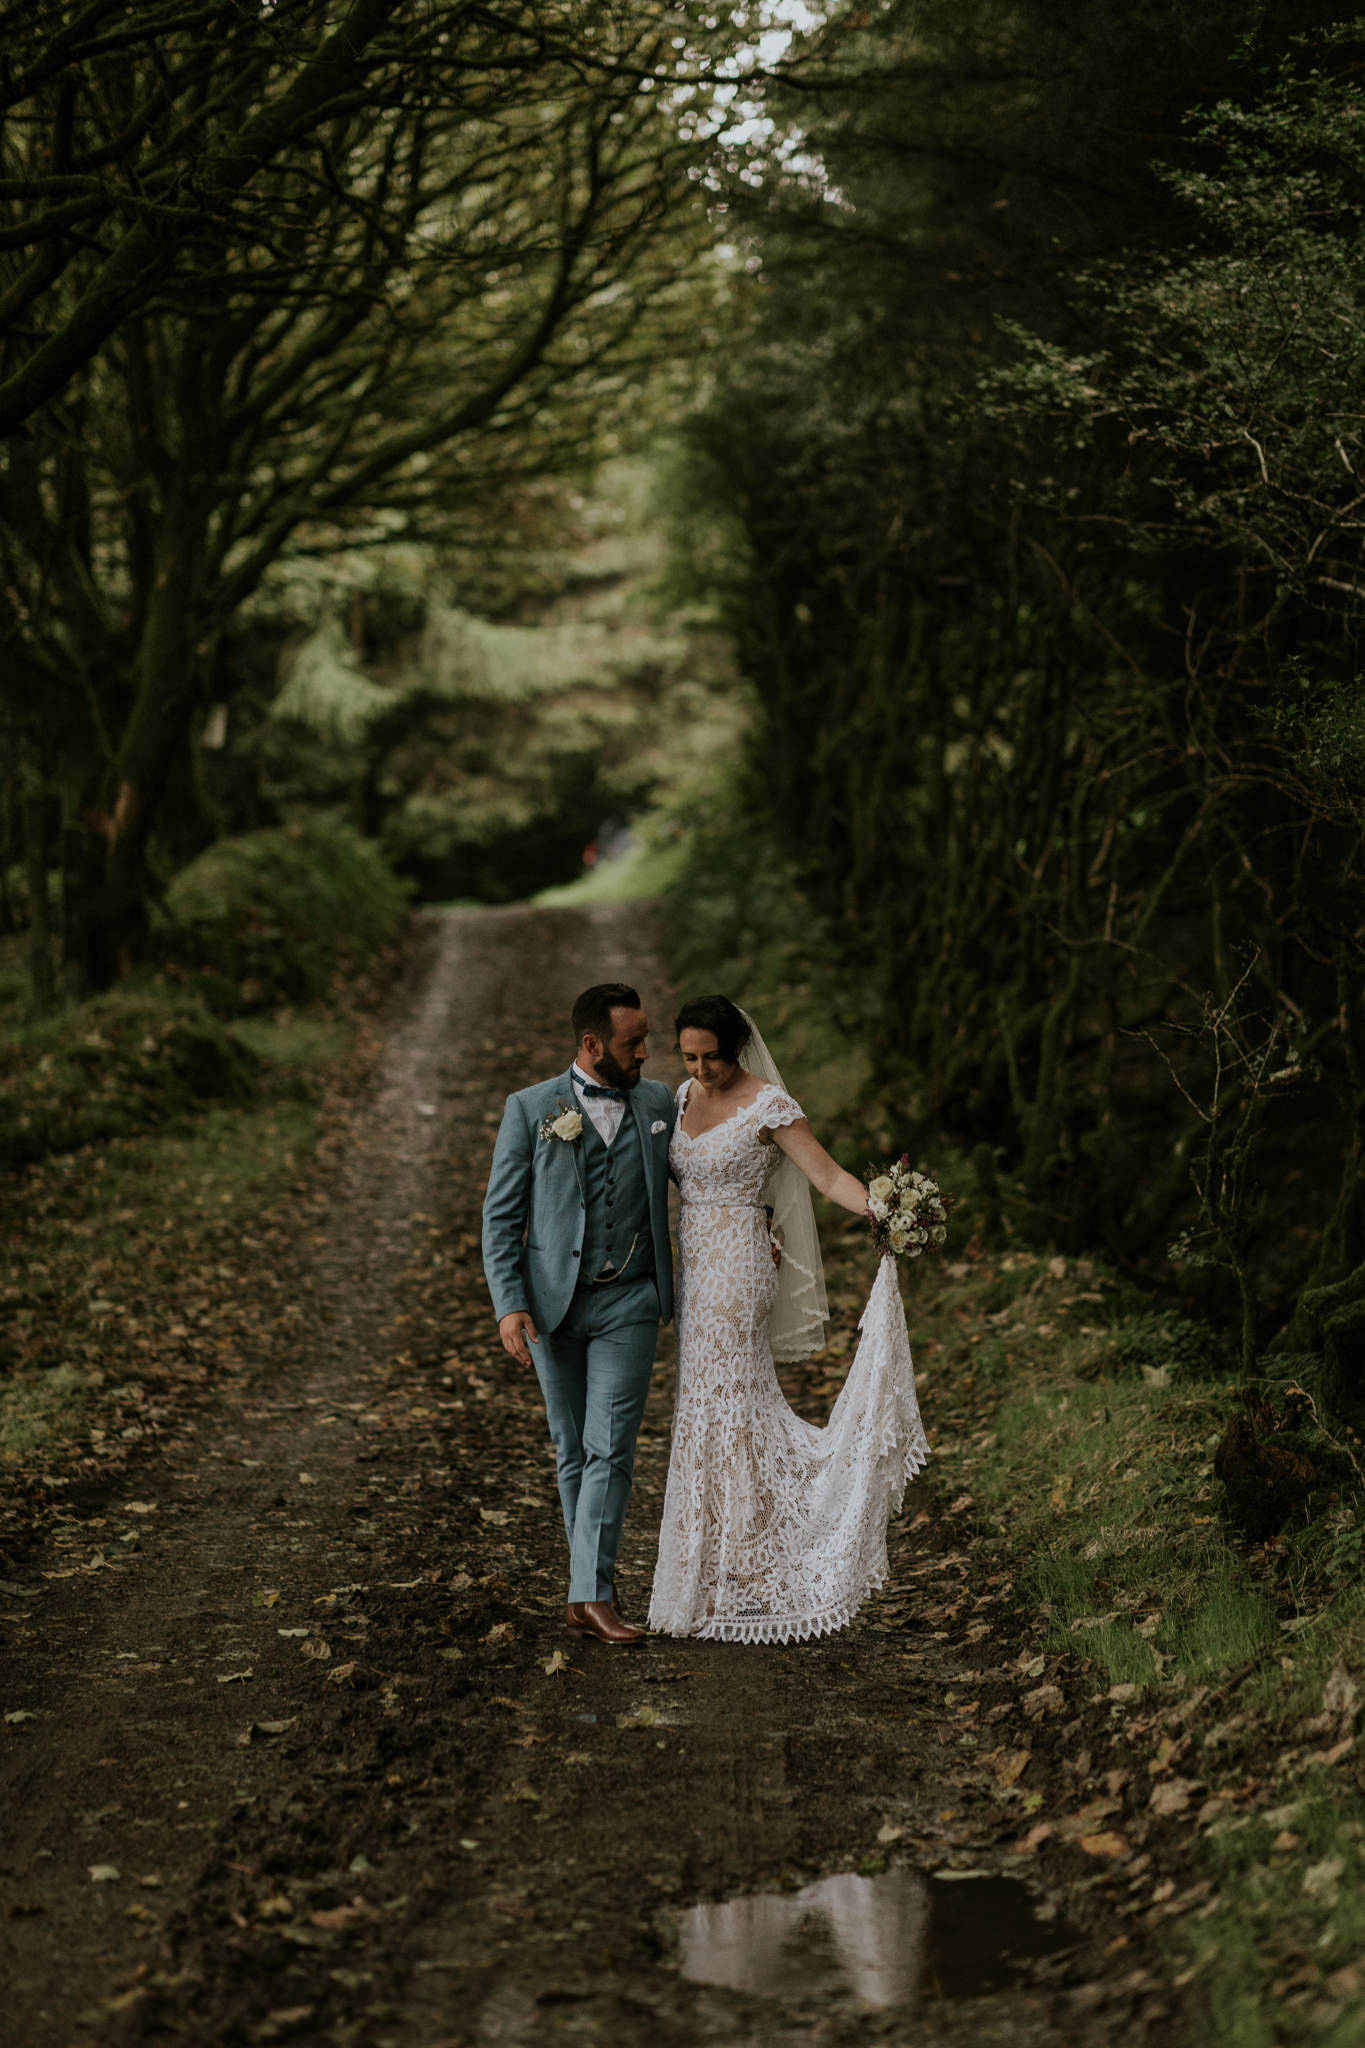 Jamie&Steve_Ireland_KristieCarrickPhotography_SCREEN-692.jpg